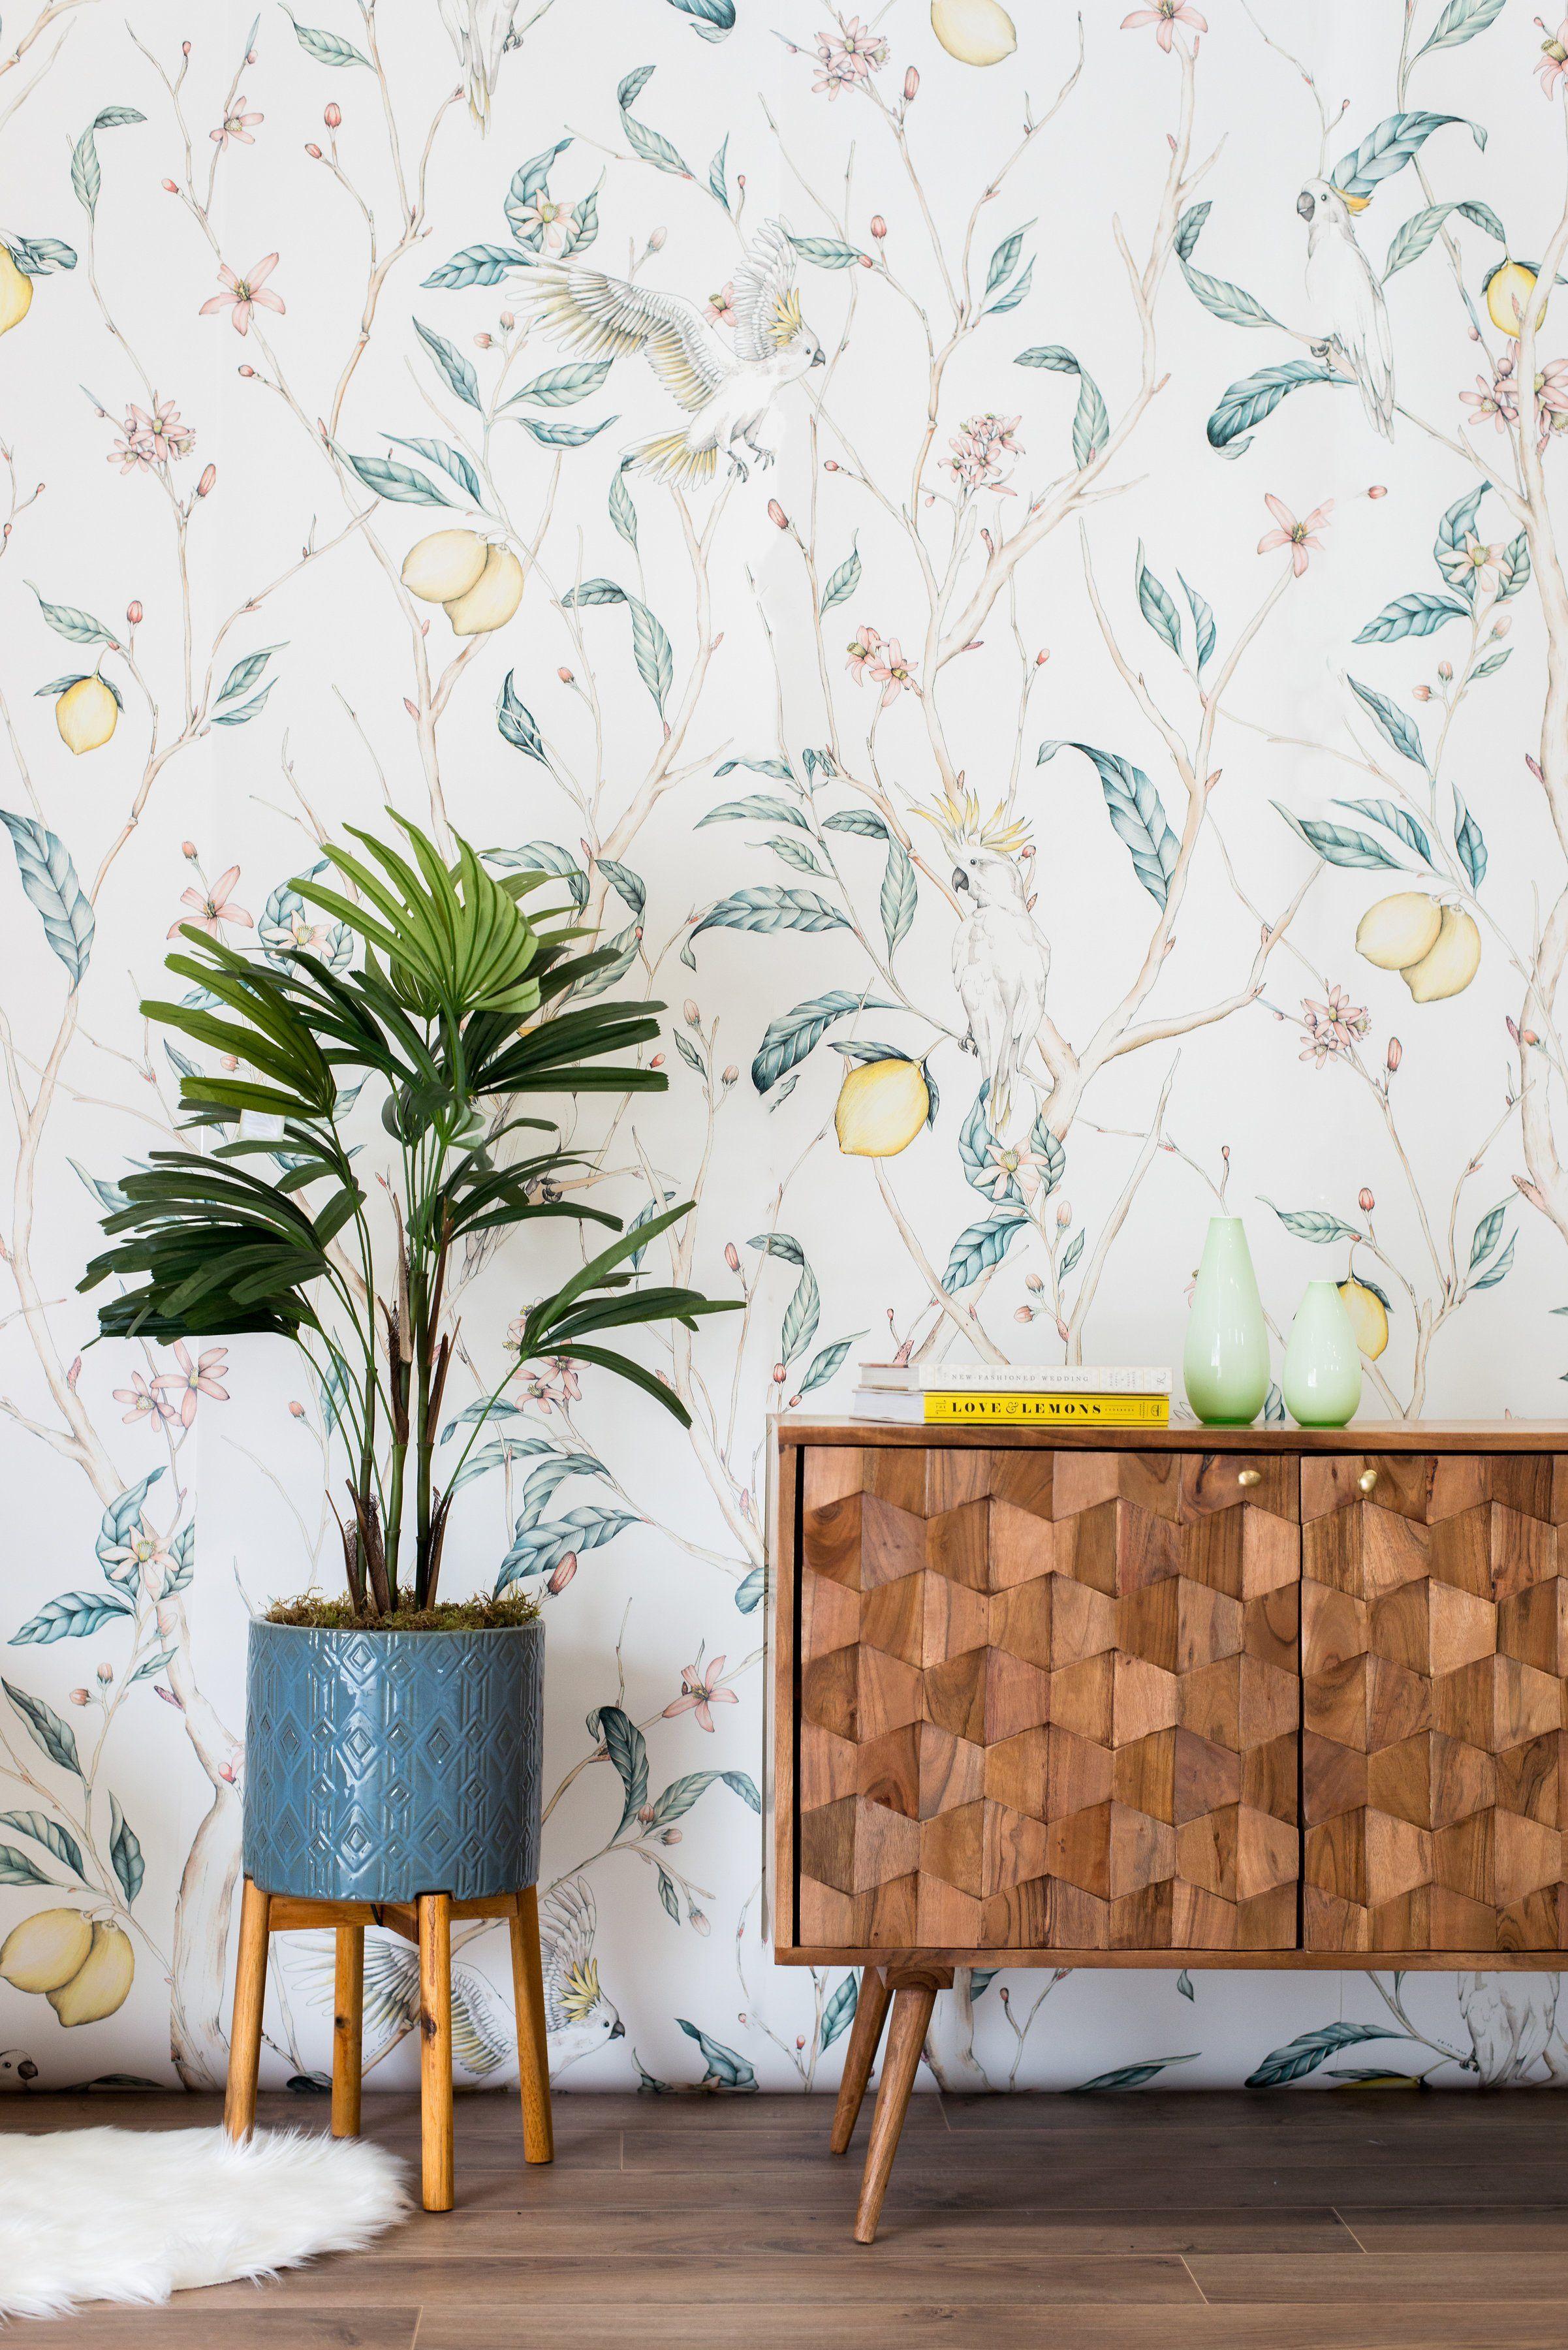 The Verbena Lemon Tree Wallpaper In 2021 Green Leaf Wallpaper Tree Wallpaper Leaf Wallpaper